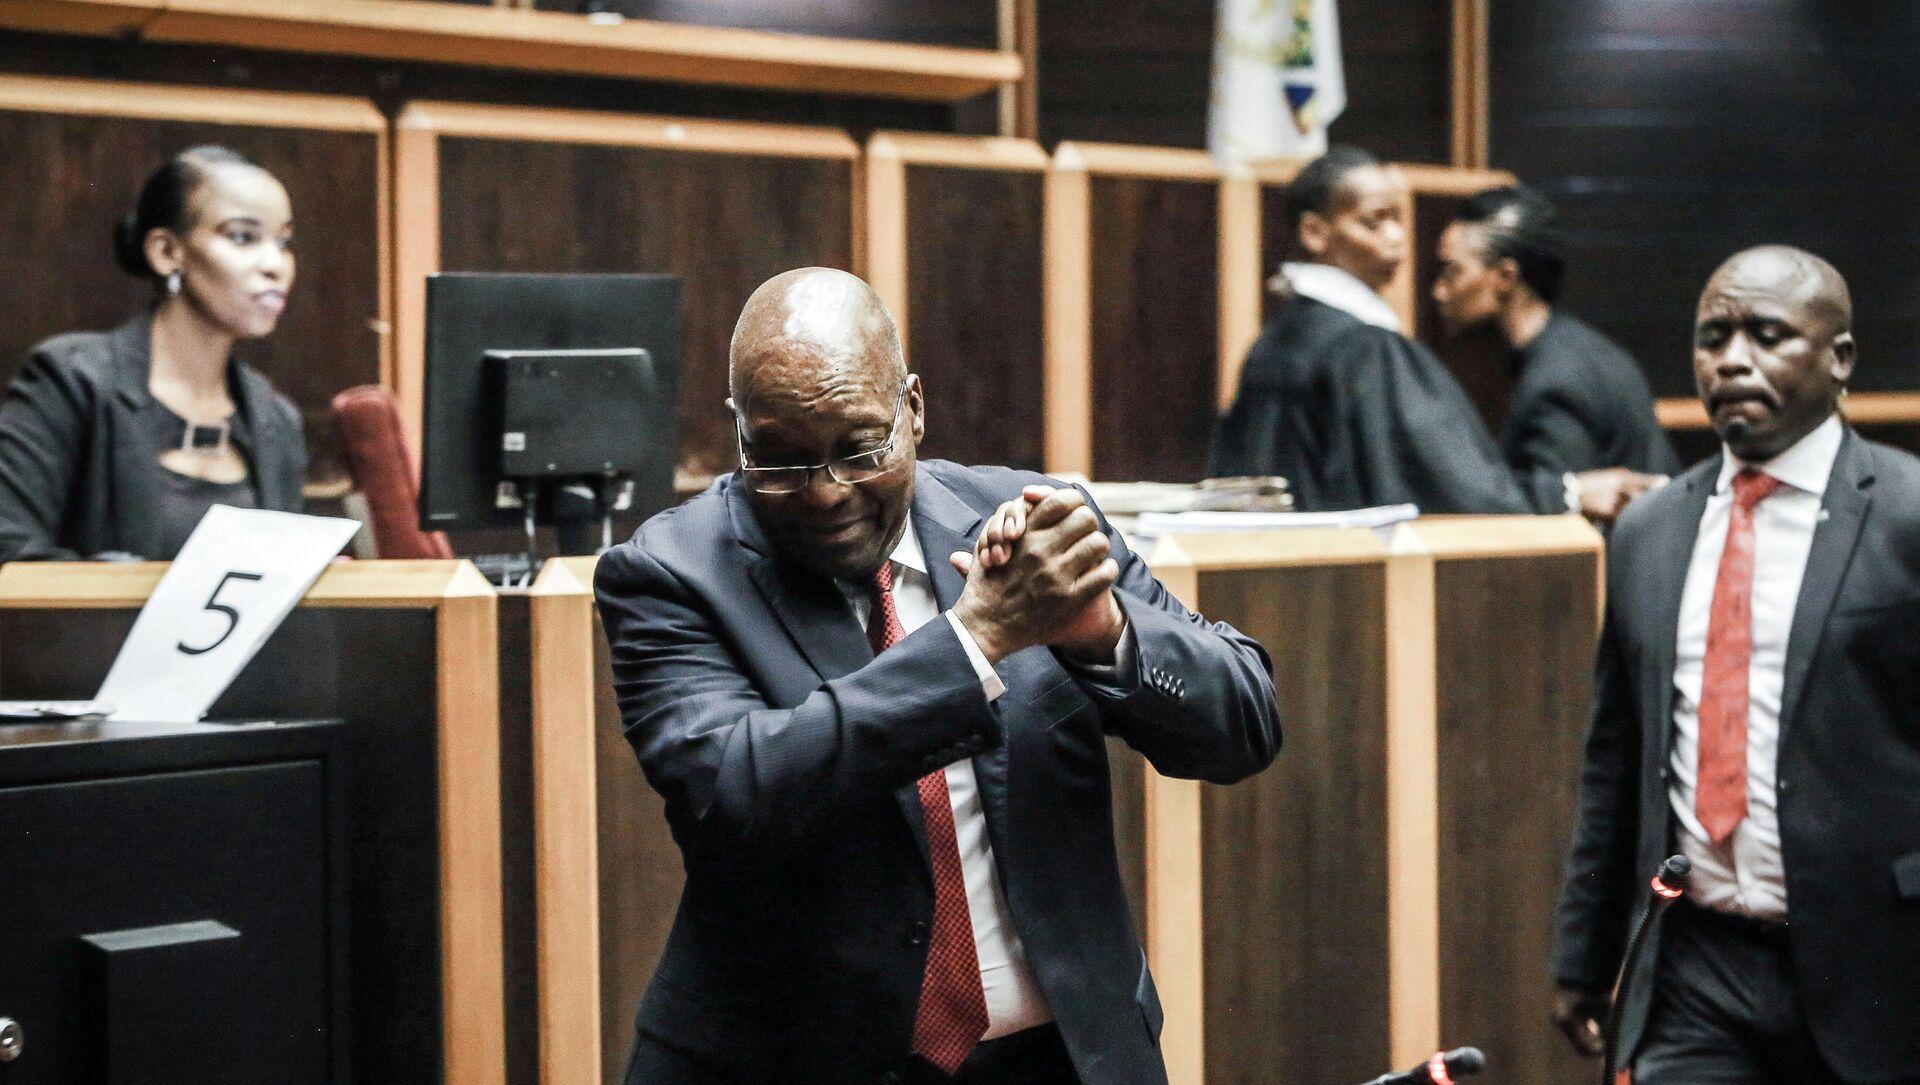 Jacob Zuma, l'ancien président sud-africain - Sputnik France, 1920, 06.08.2021